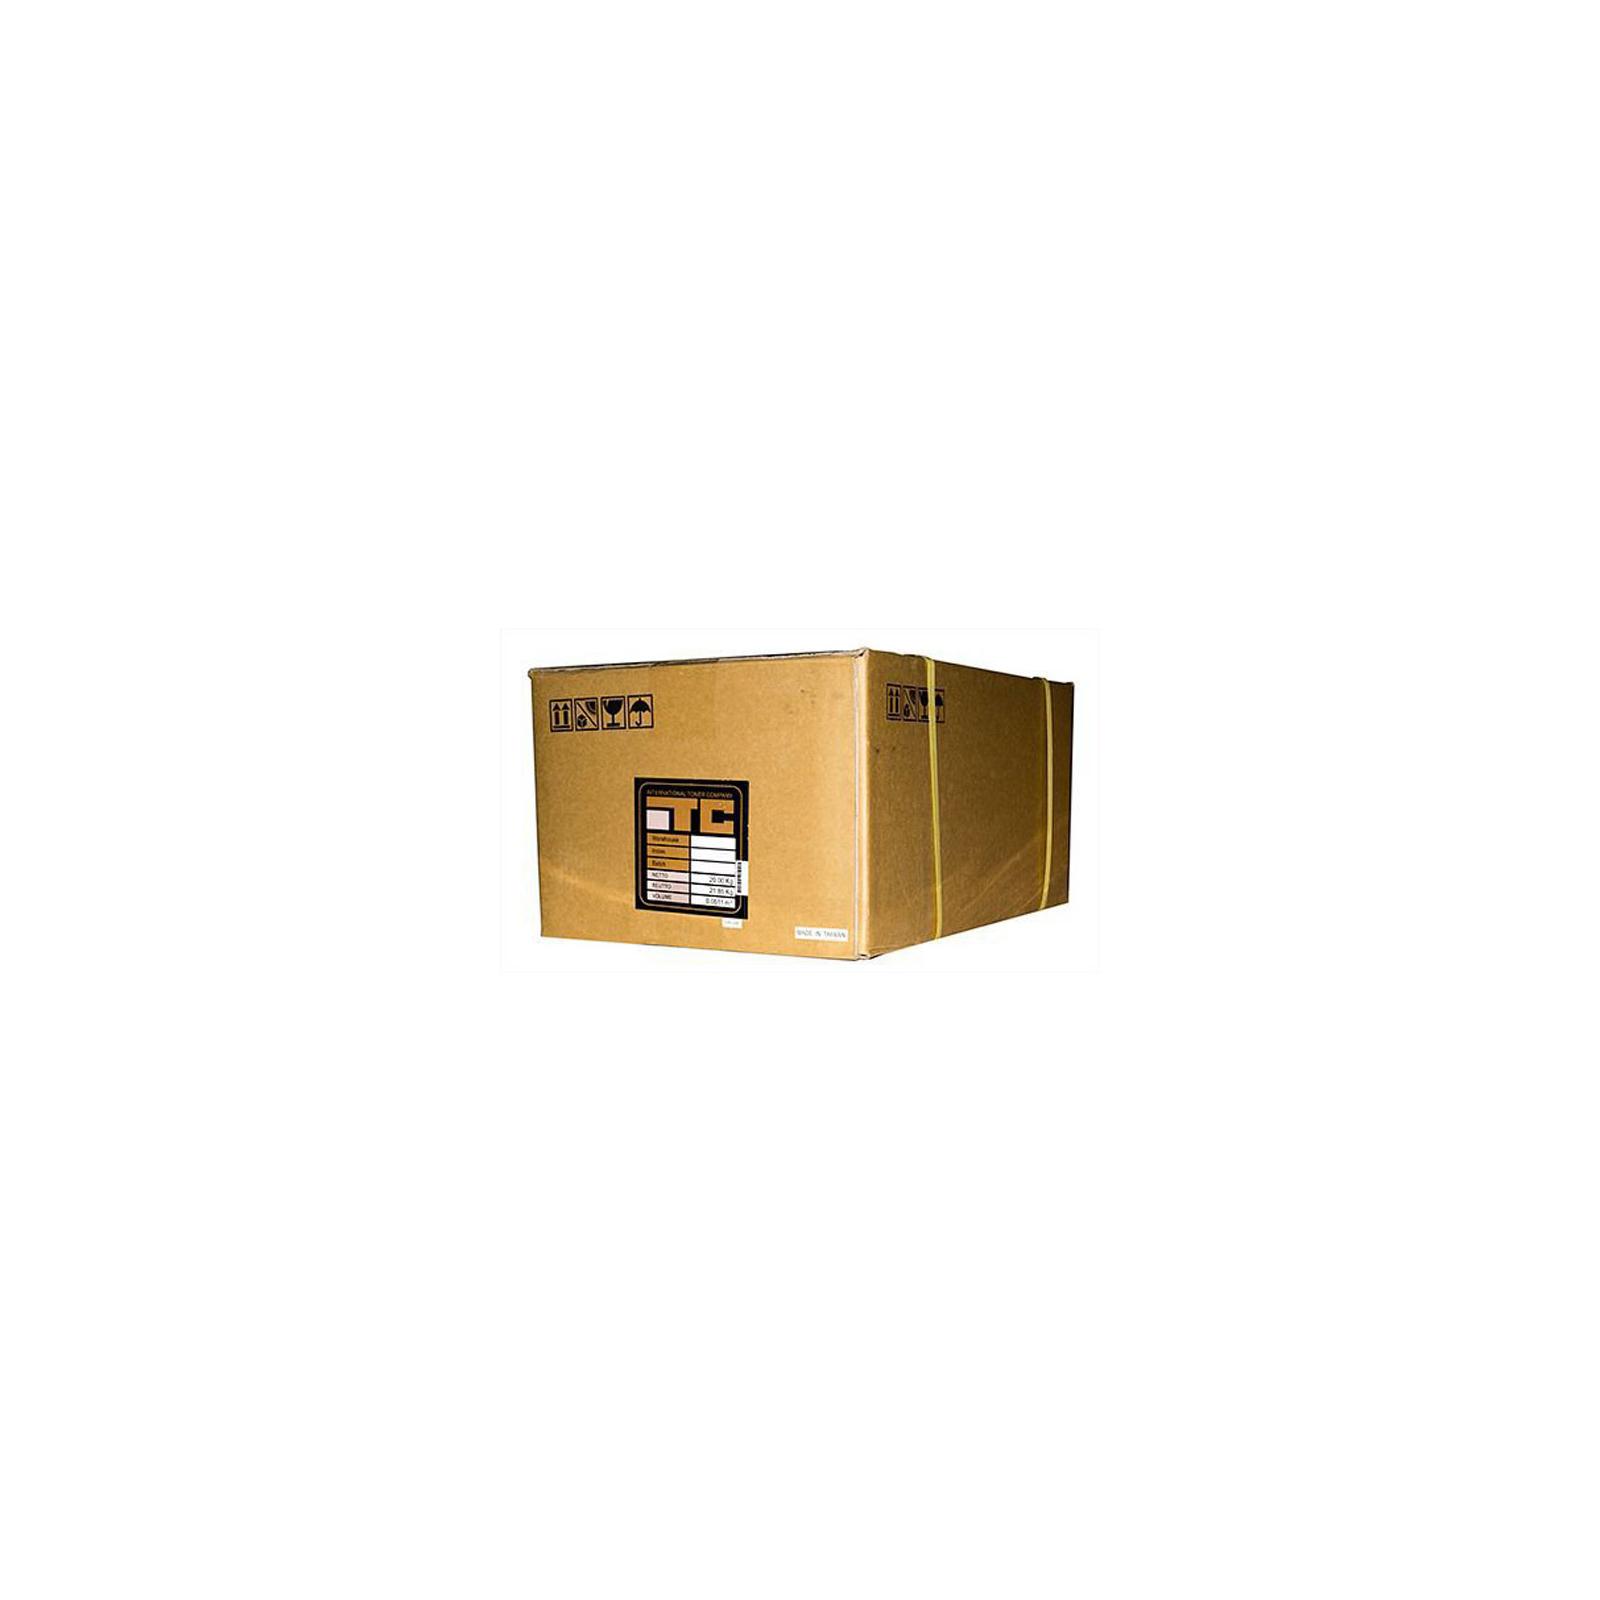 Тонер Kyocera TK-1110/1115/1120/1125 (для FS-1040/1120MFP) T141-2 TTI (AB016DD/NB-016 A1/NB-016-T141-2-10)